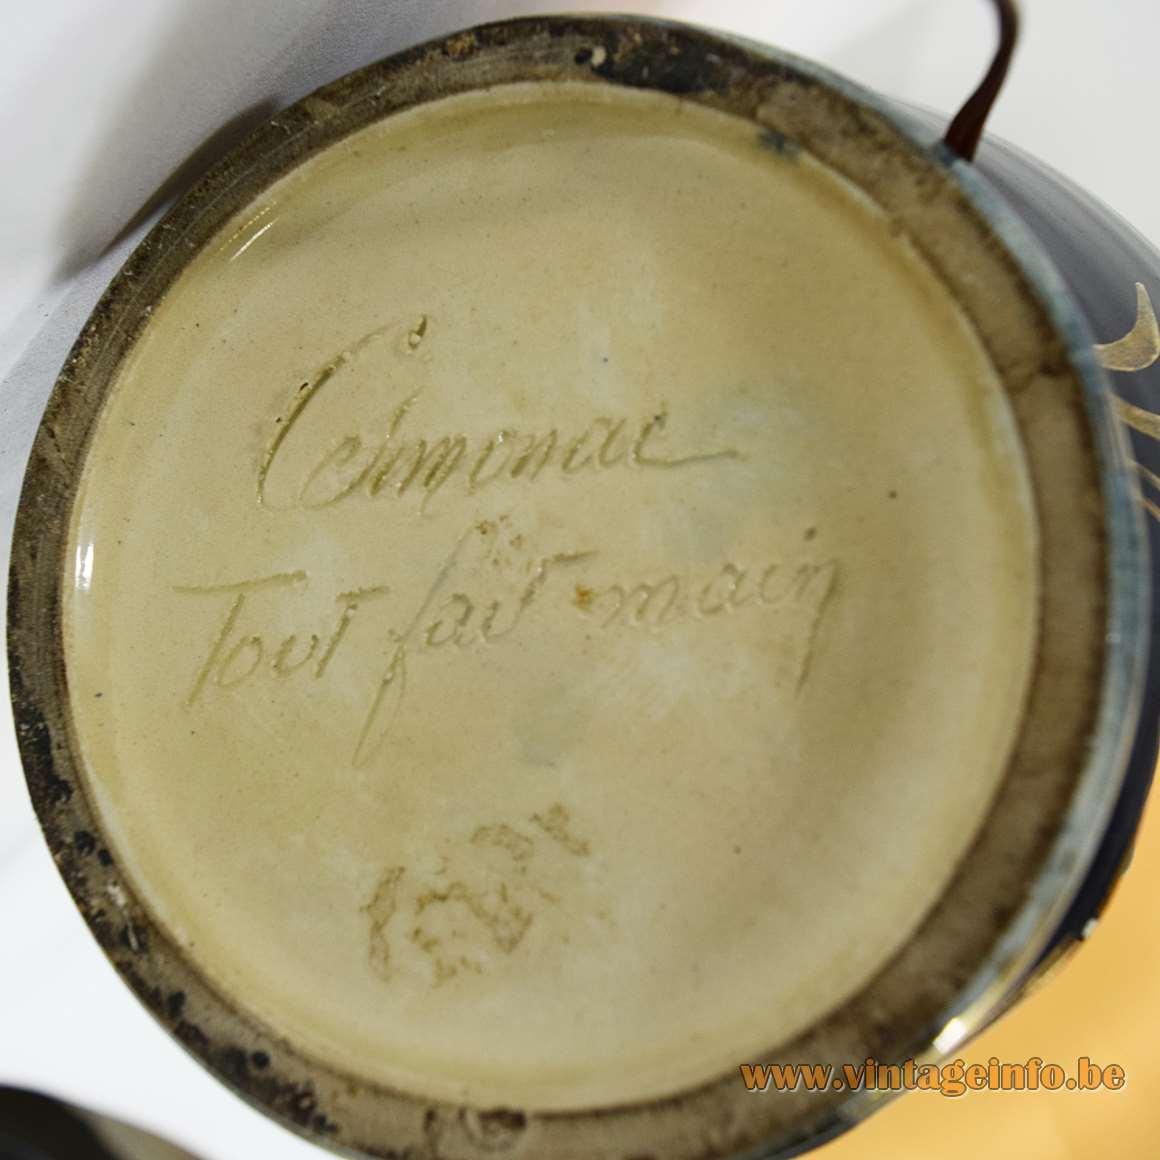 "Cermonac Monaco Table Lamp - Tout fait main - ""All by hand"""